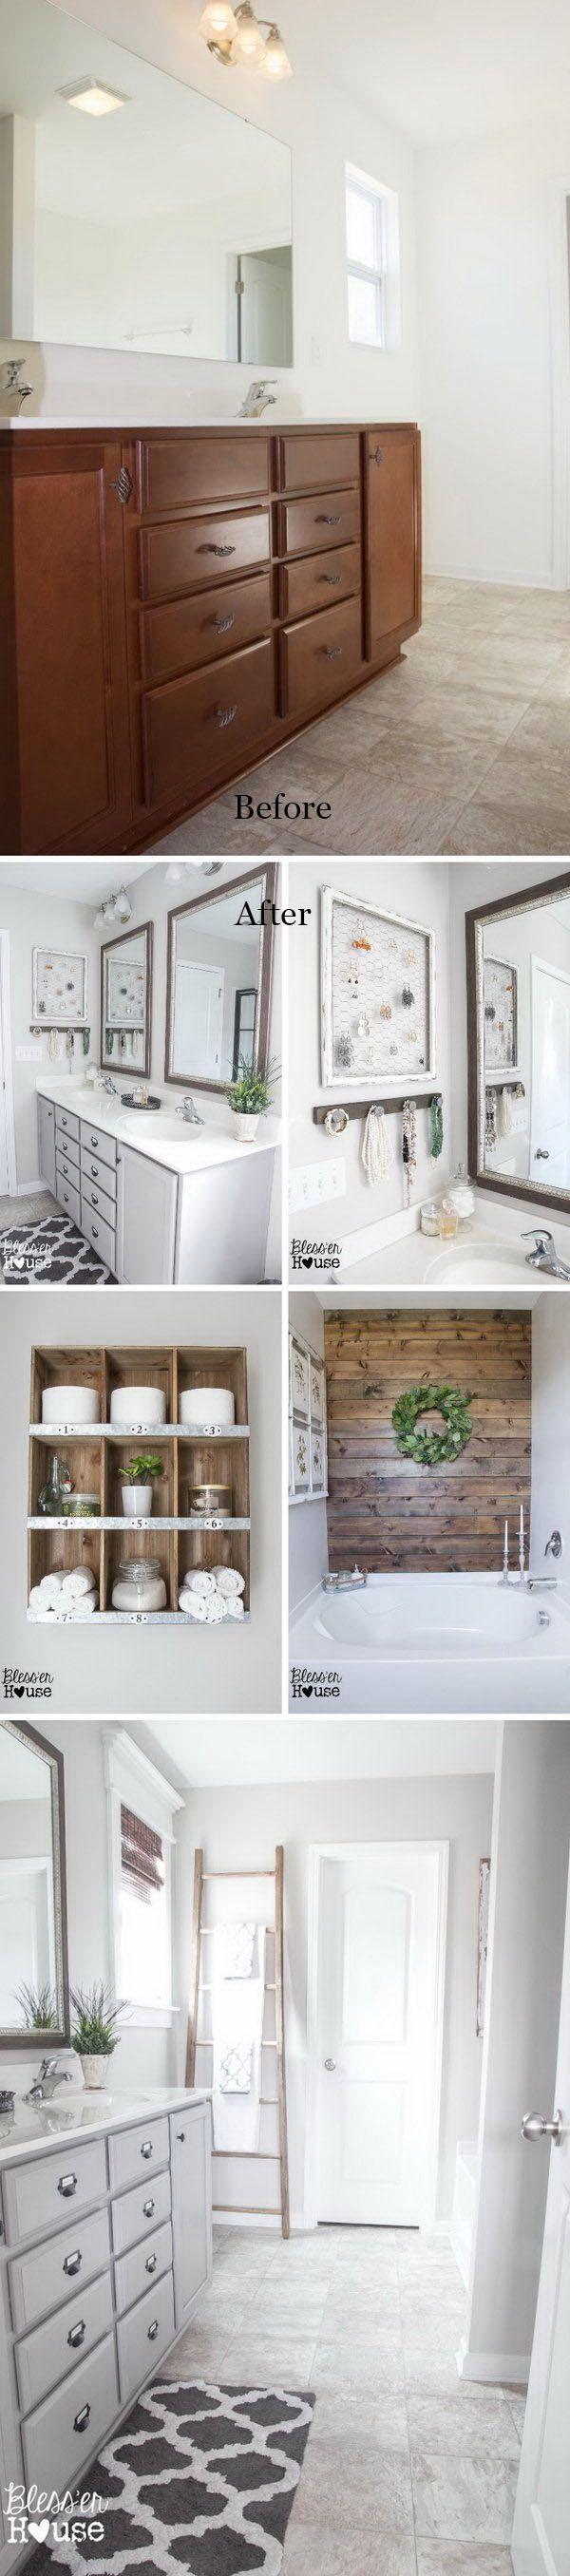 Best Master Bath Ideas Images On Pinterest Bathroom - Bathroom remodel des moines for bathroom decor ideas